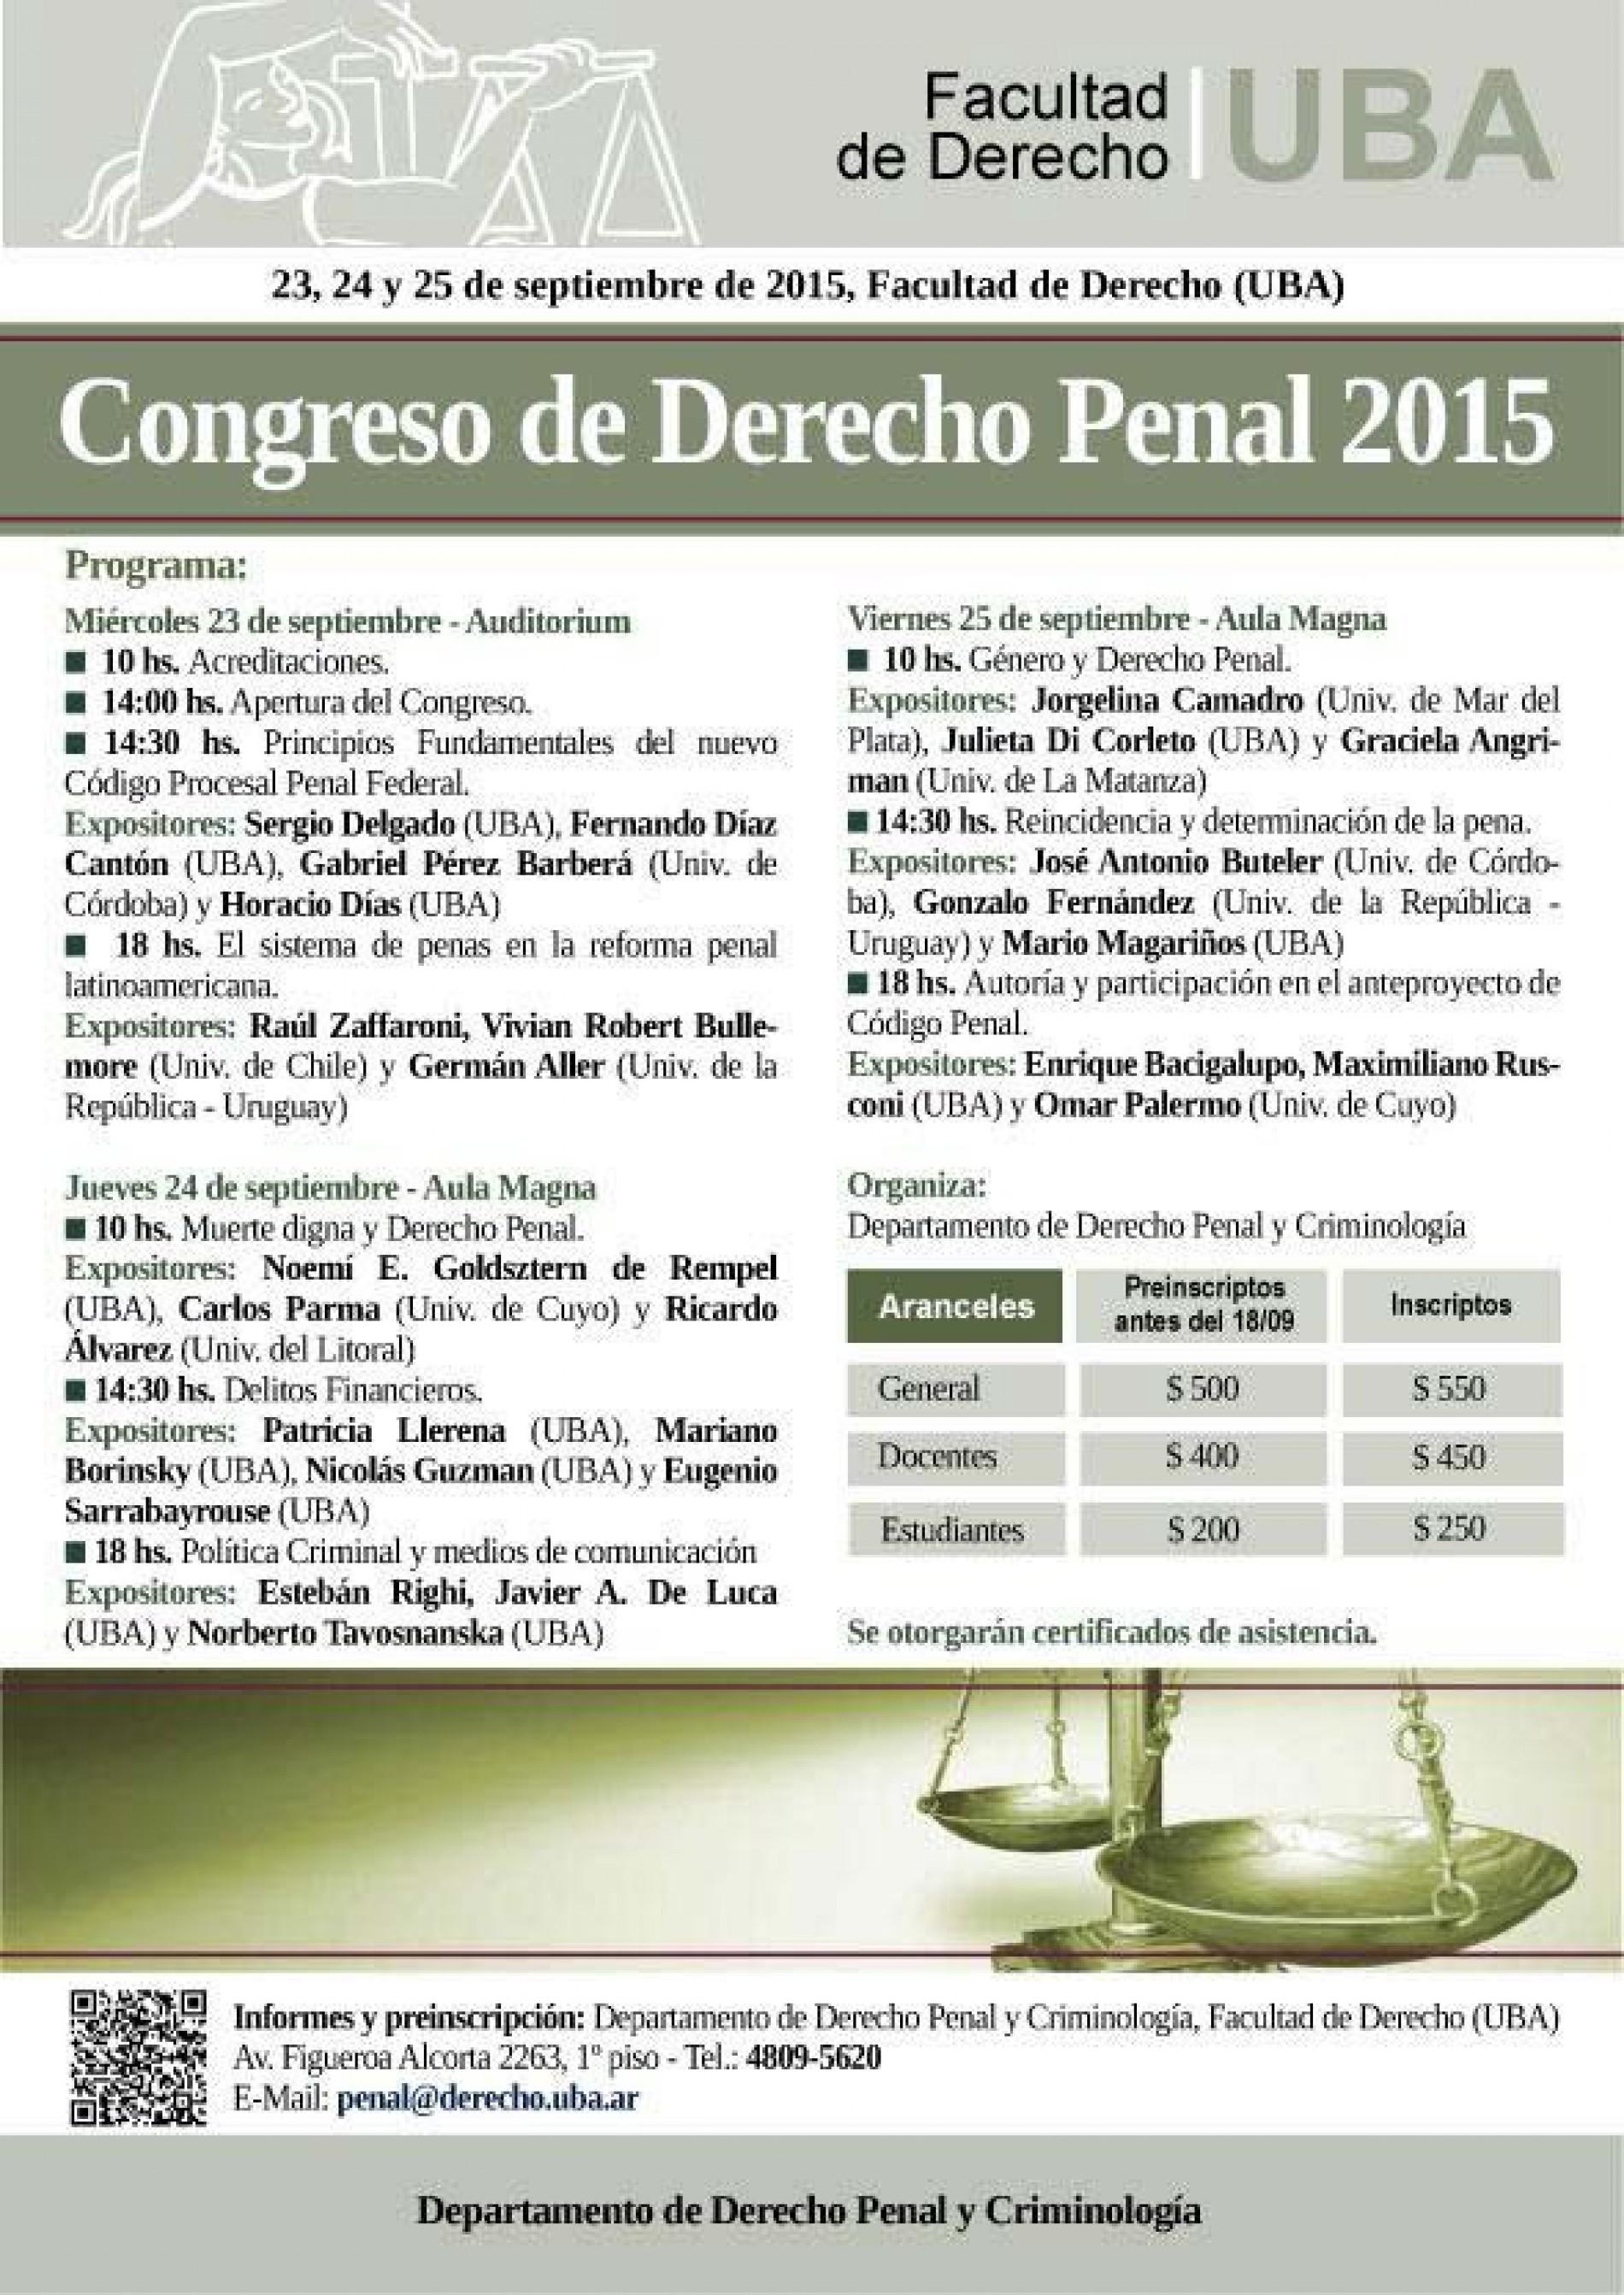 Congreso de Derecho Penal 2015